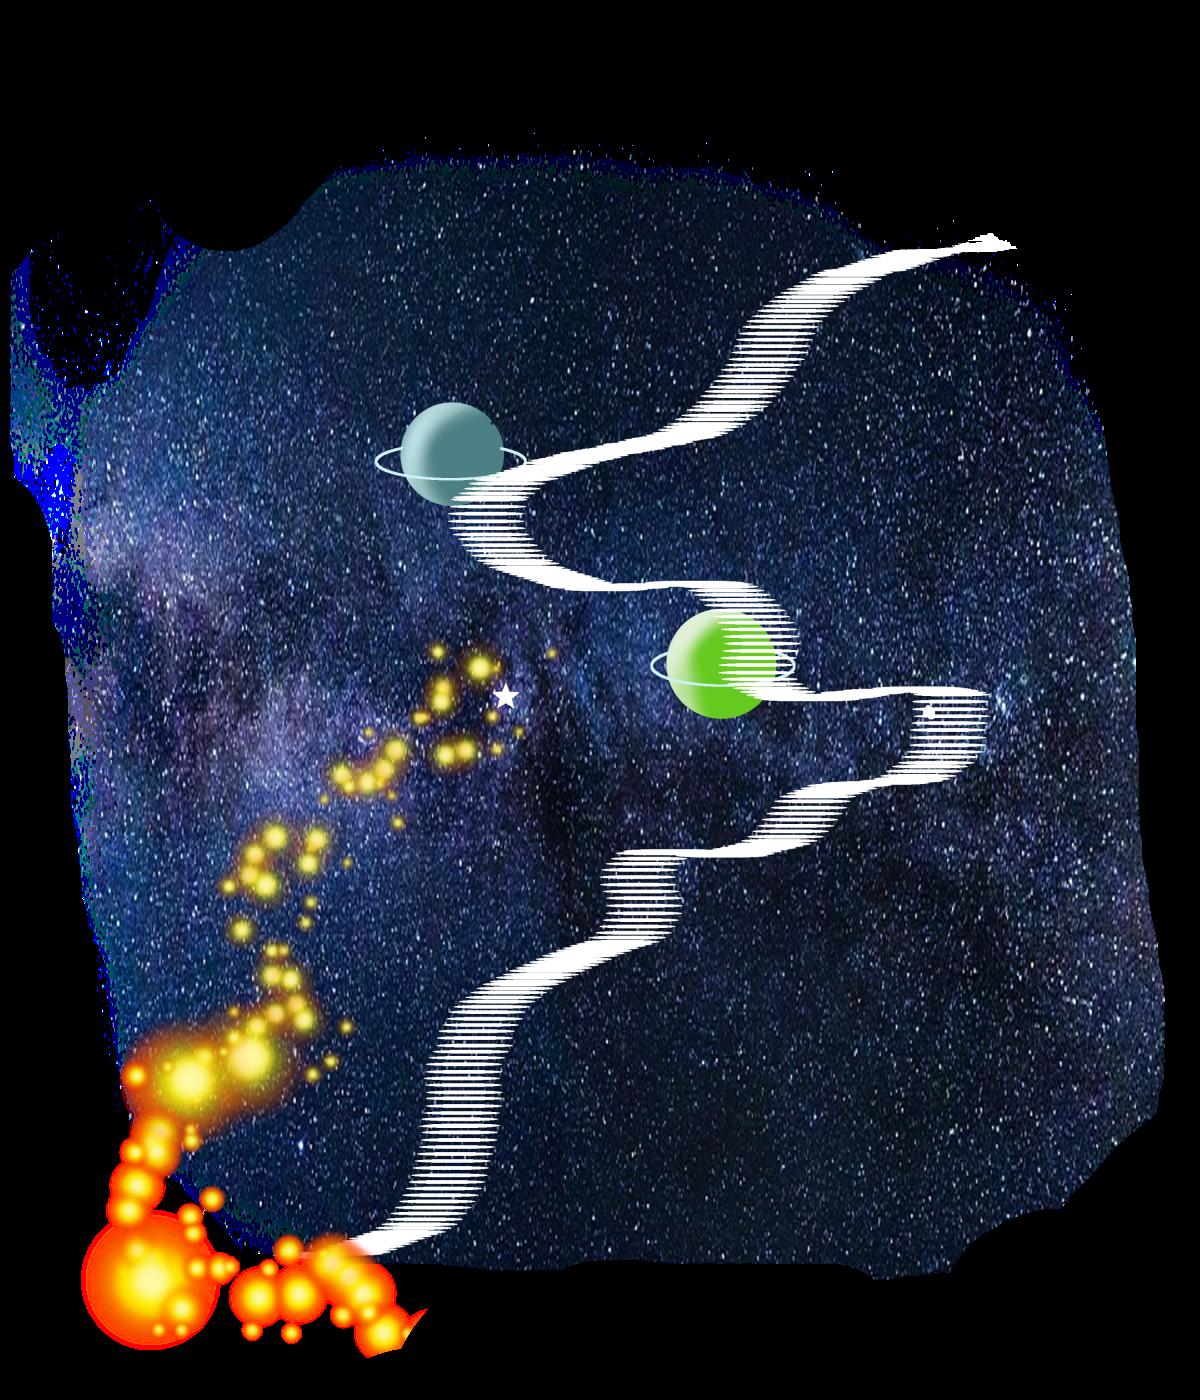 Illustration Milchstraße